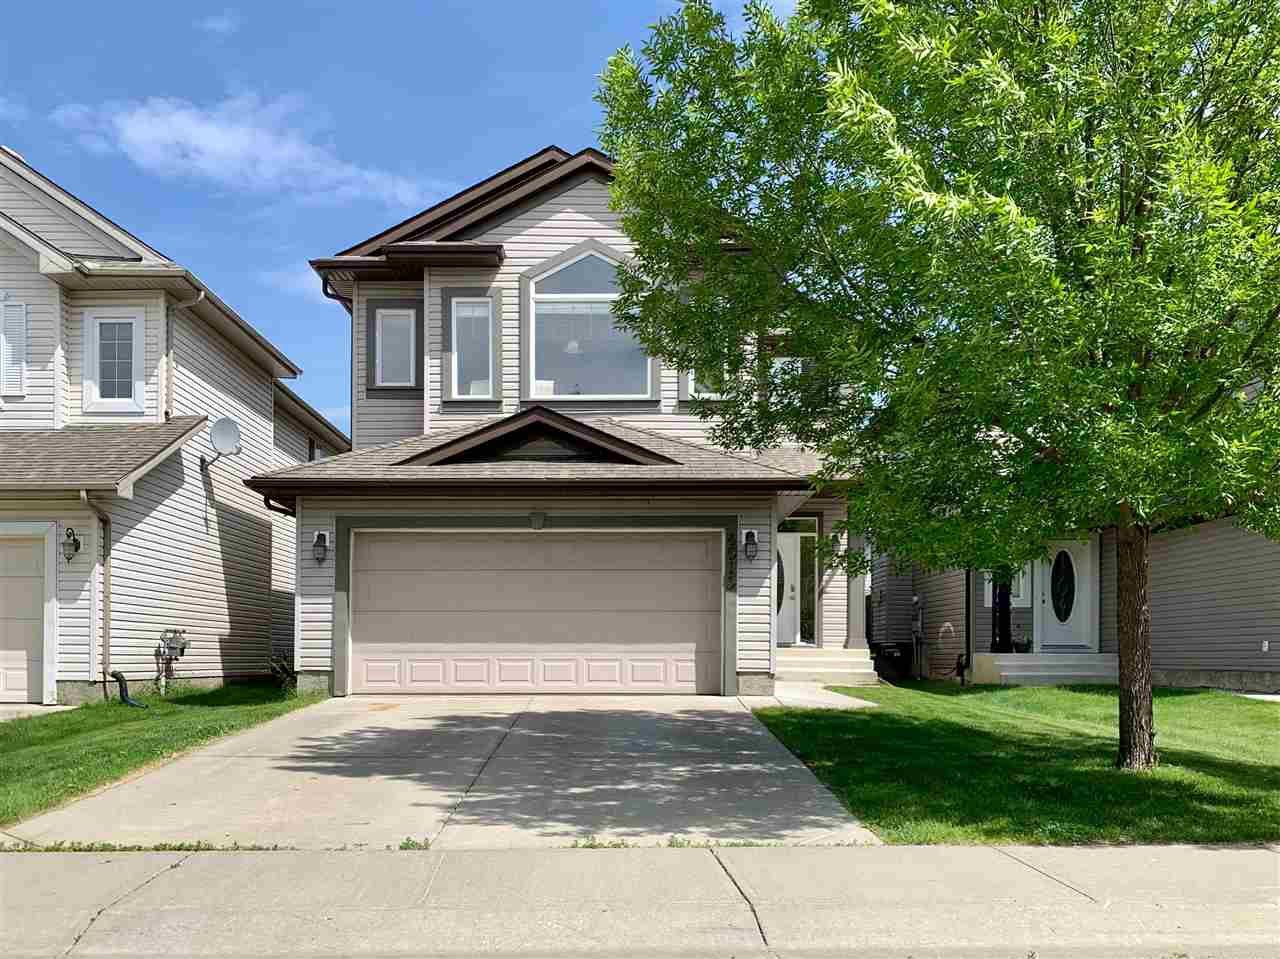 Main Photo: 4615 203 Street in Edmonton: Zone 58 House for sale : MLS®# E4203194